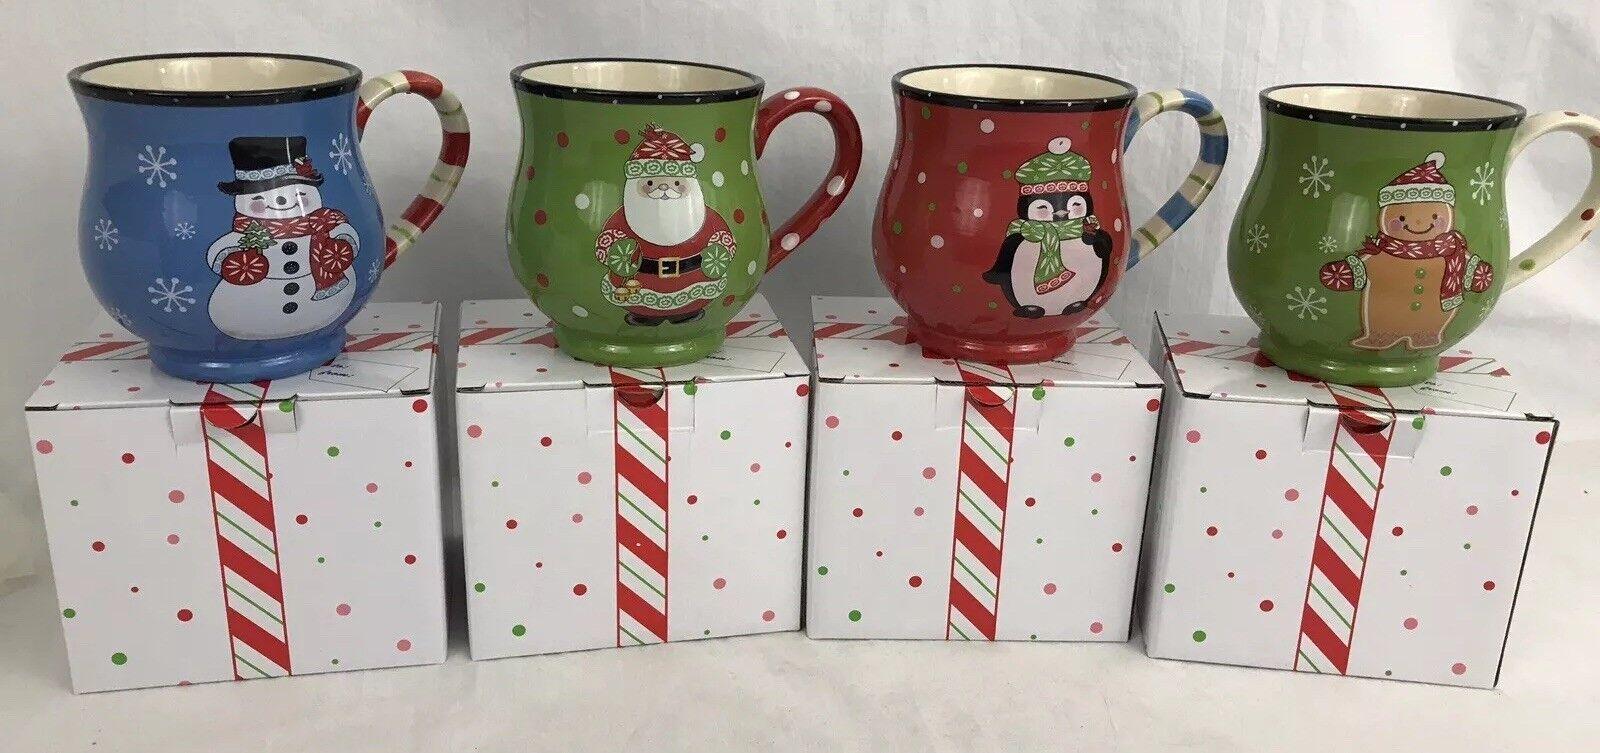 Temp Tations Winter Whimsy Mug Set Santa Snowman Penguin Gingerbread New W Boxes